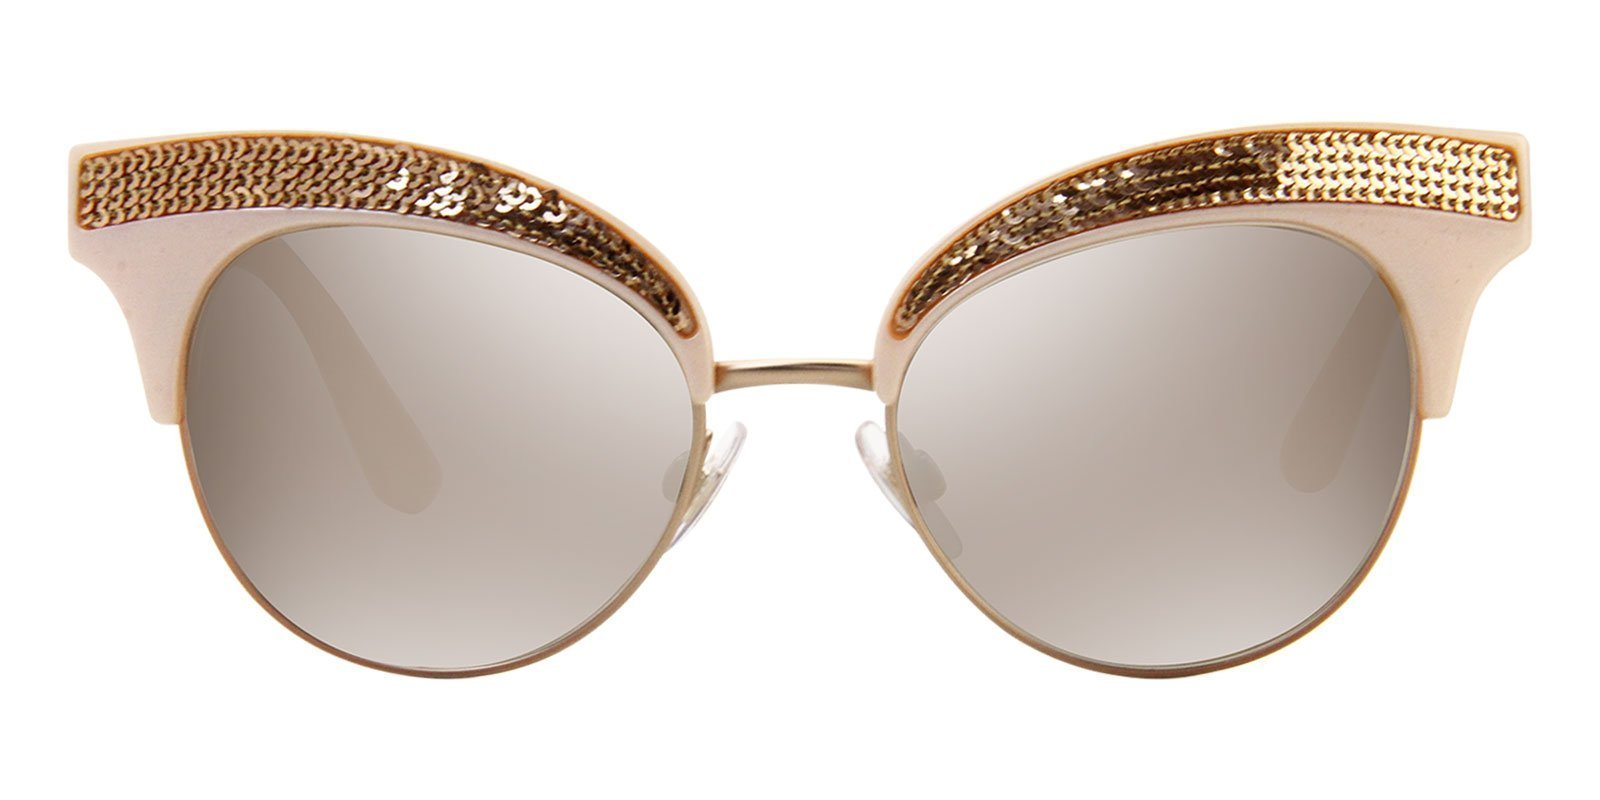 1d72cb7ab1 Dolce Gabbana - DG6109 Pink - Gold sunglasses